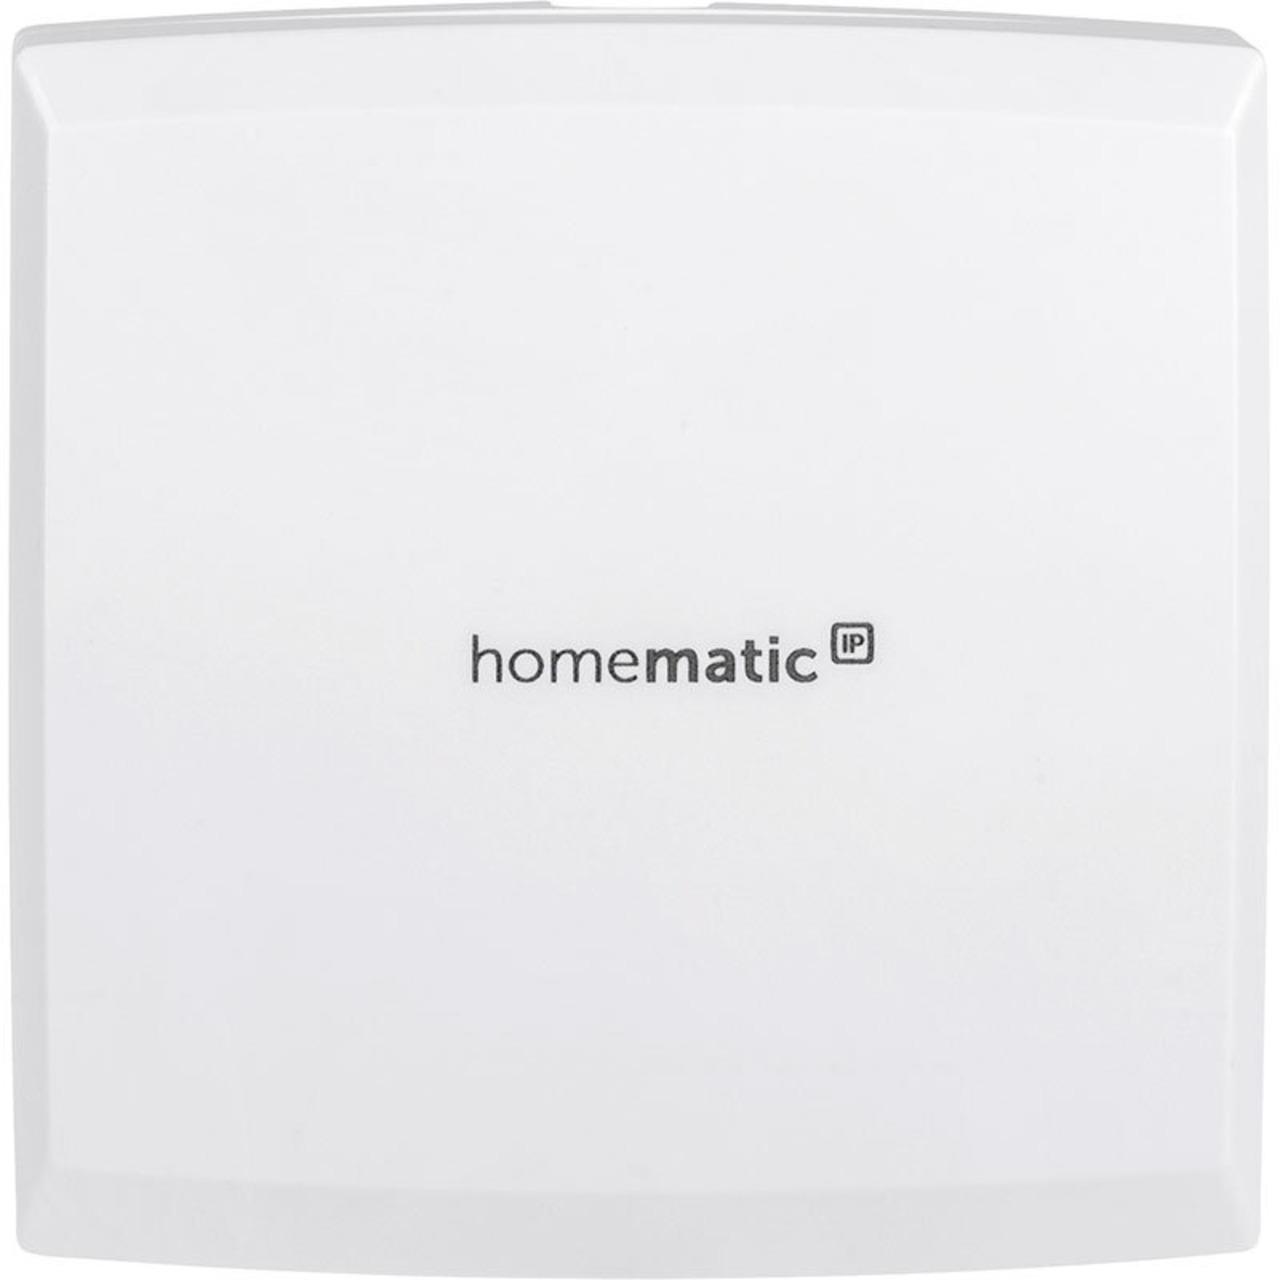 ELV Homematic IP Komplettbausatz Garagentortaster-Schaltaktor HmIP-WGC- fernbedienbar